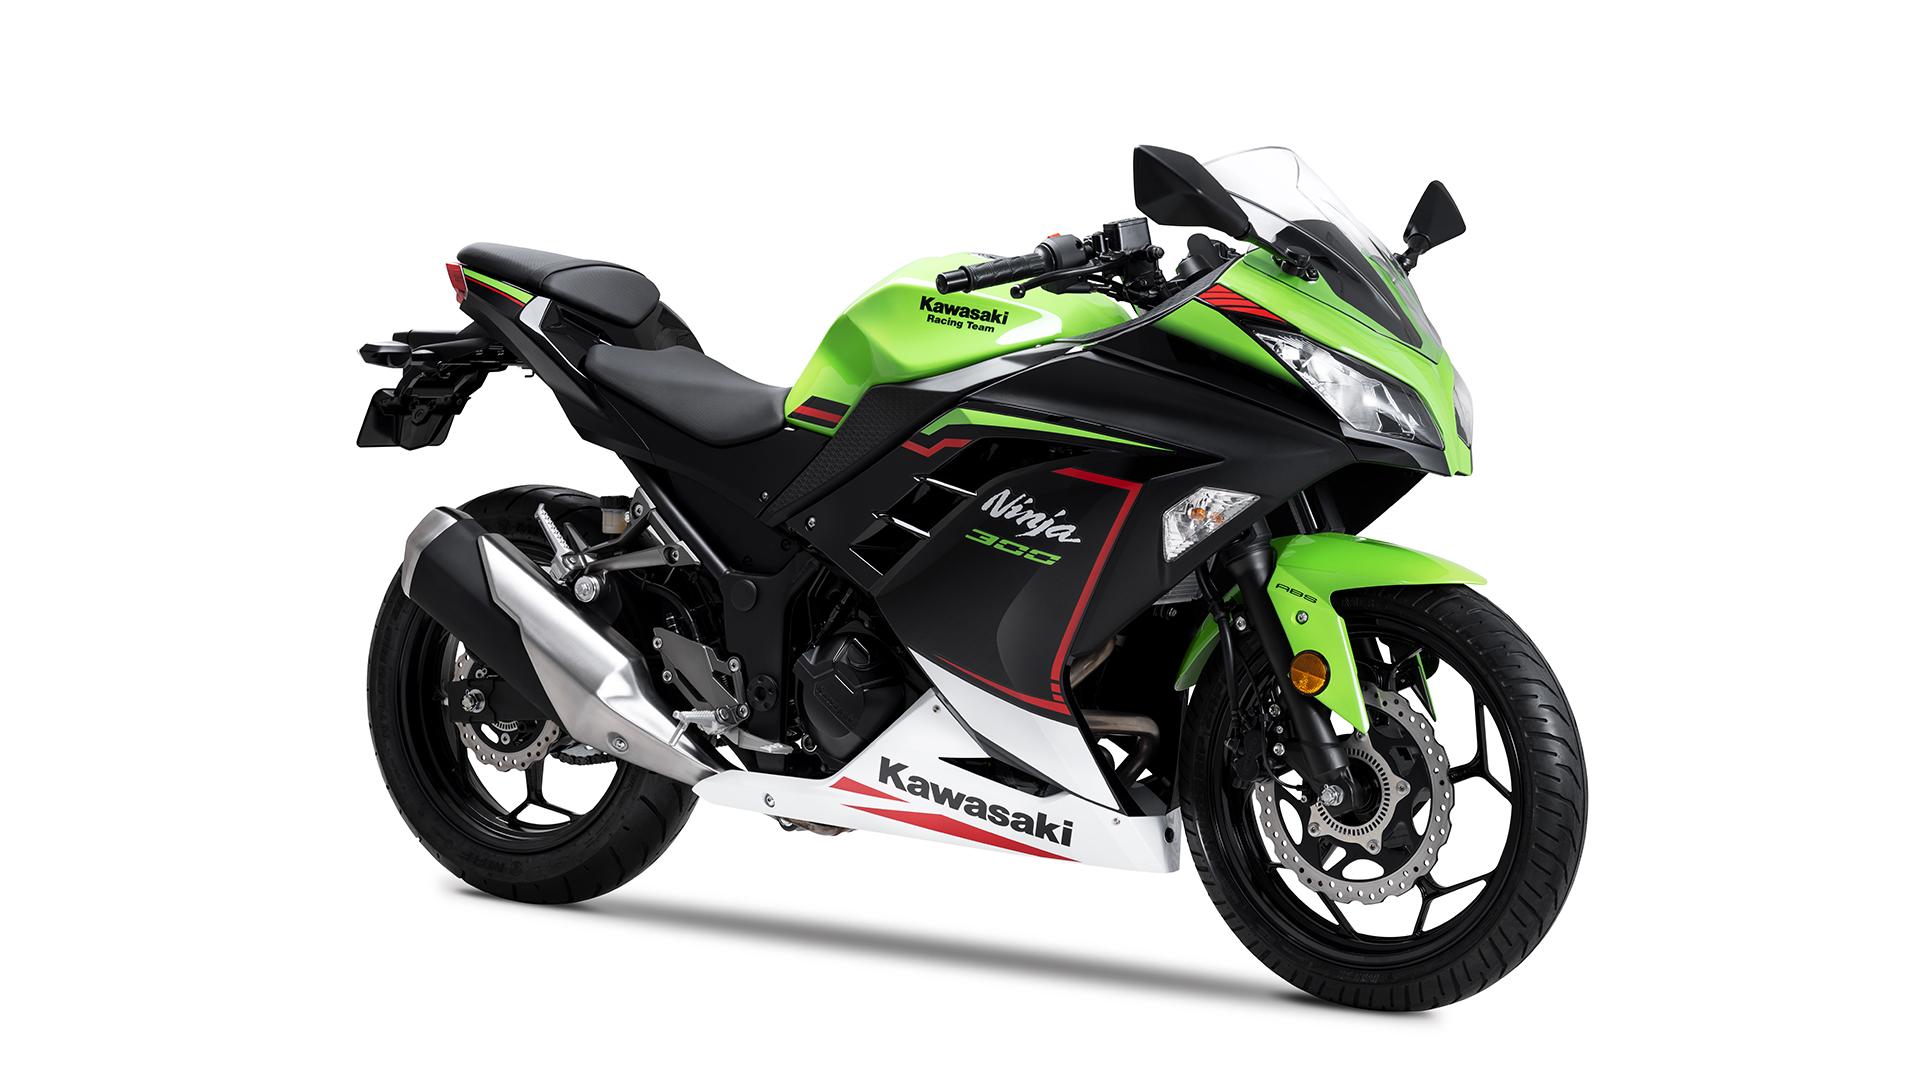 Kawasaki Ninja 300 2021 STD